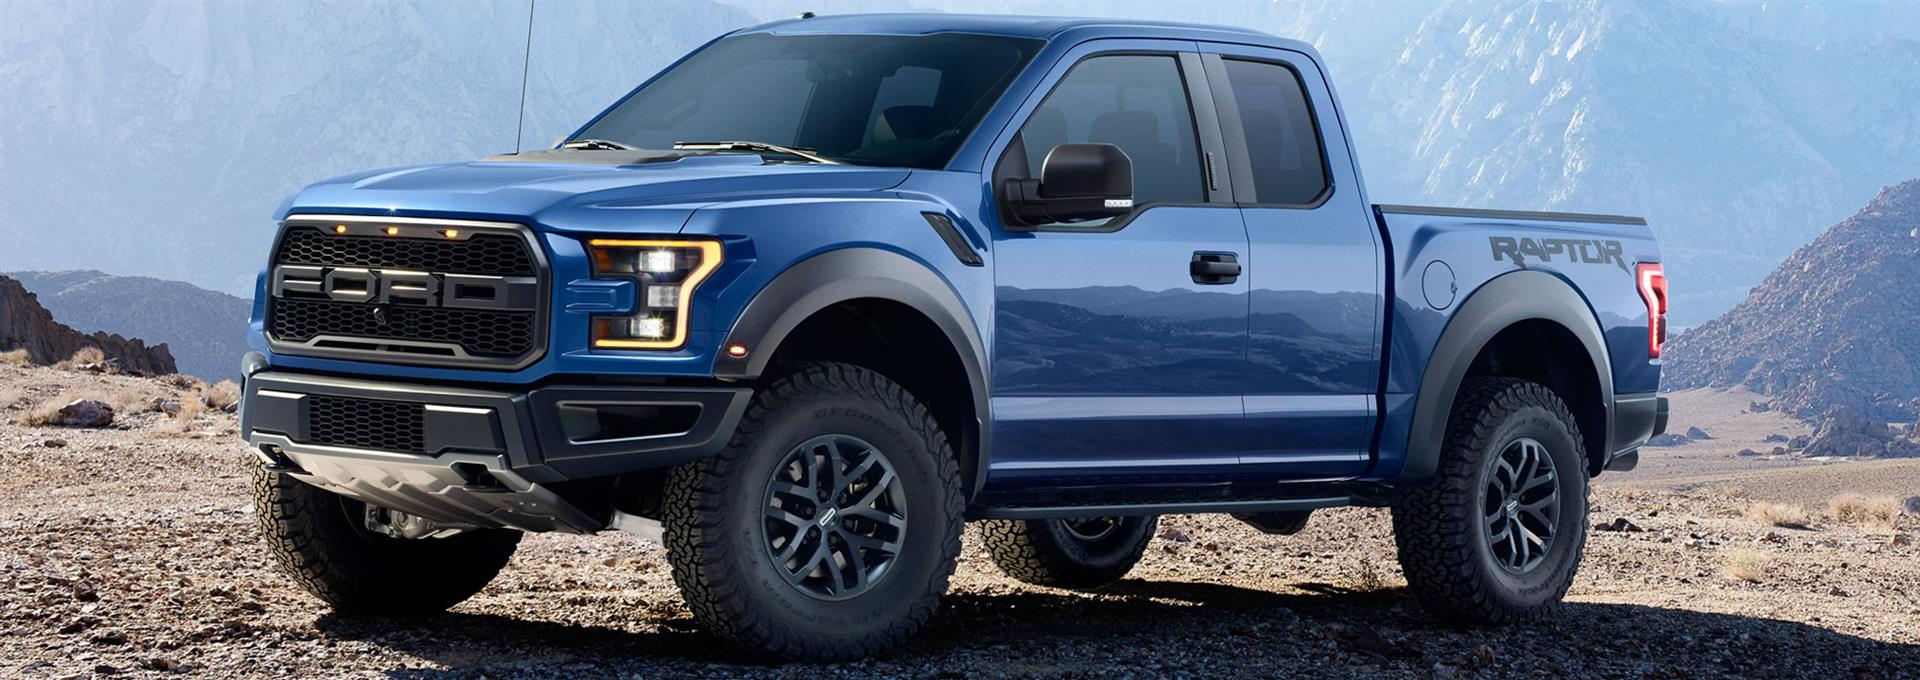 N & N Auto Sales Houma LA   New & Used Cars Trucks Sales & Service